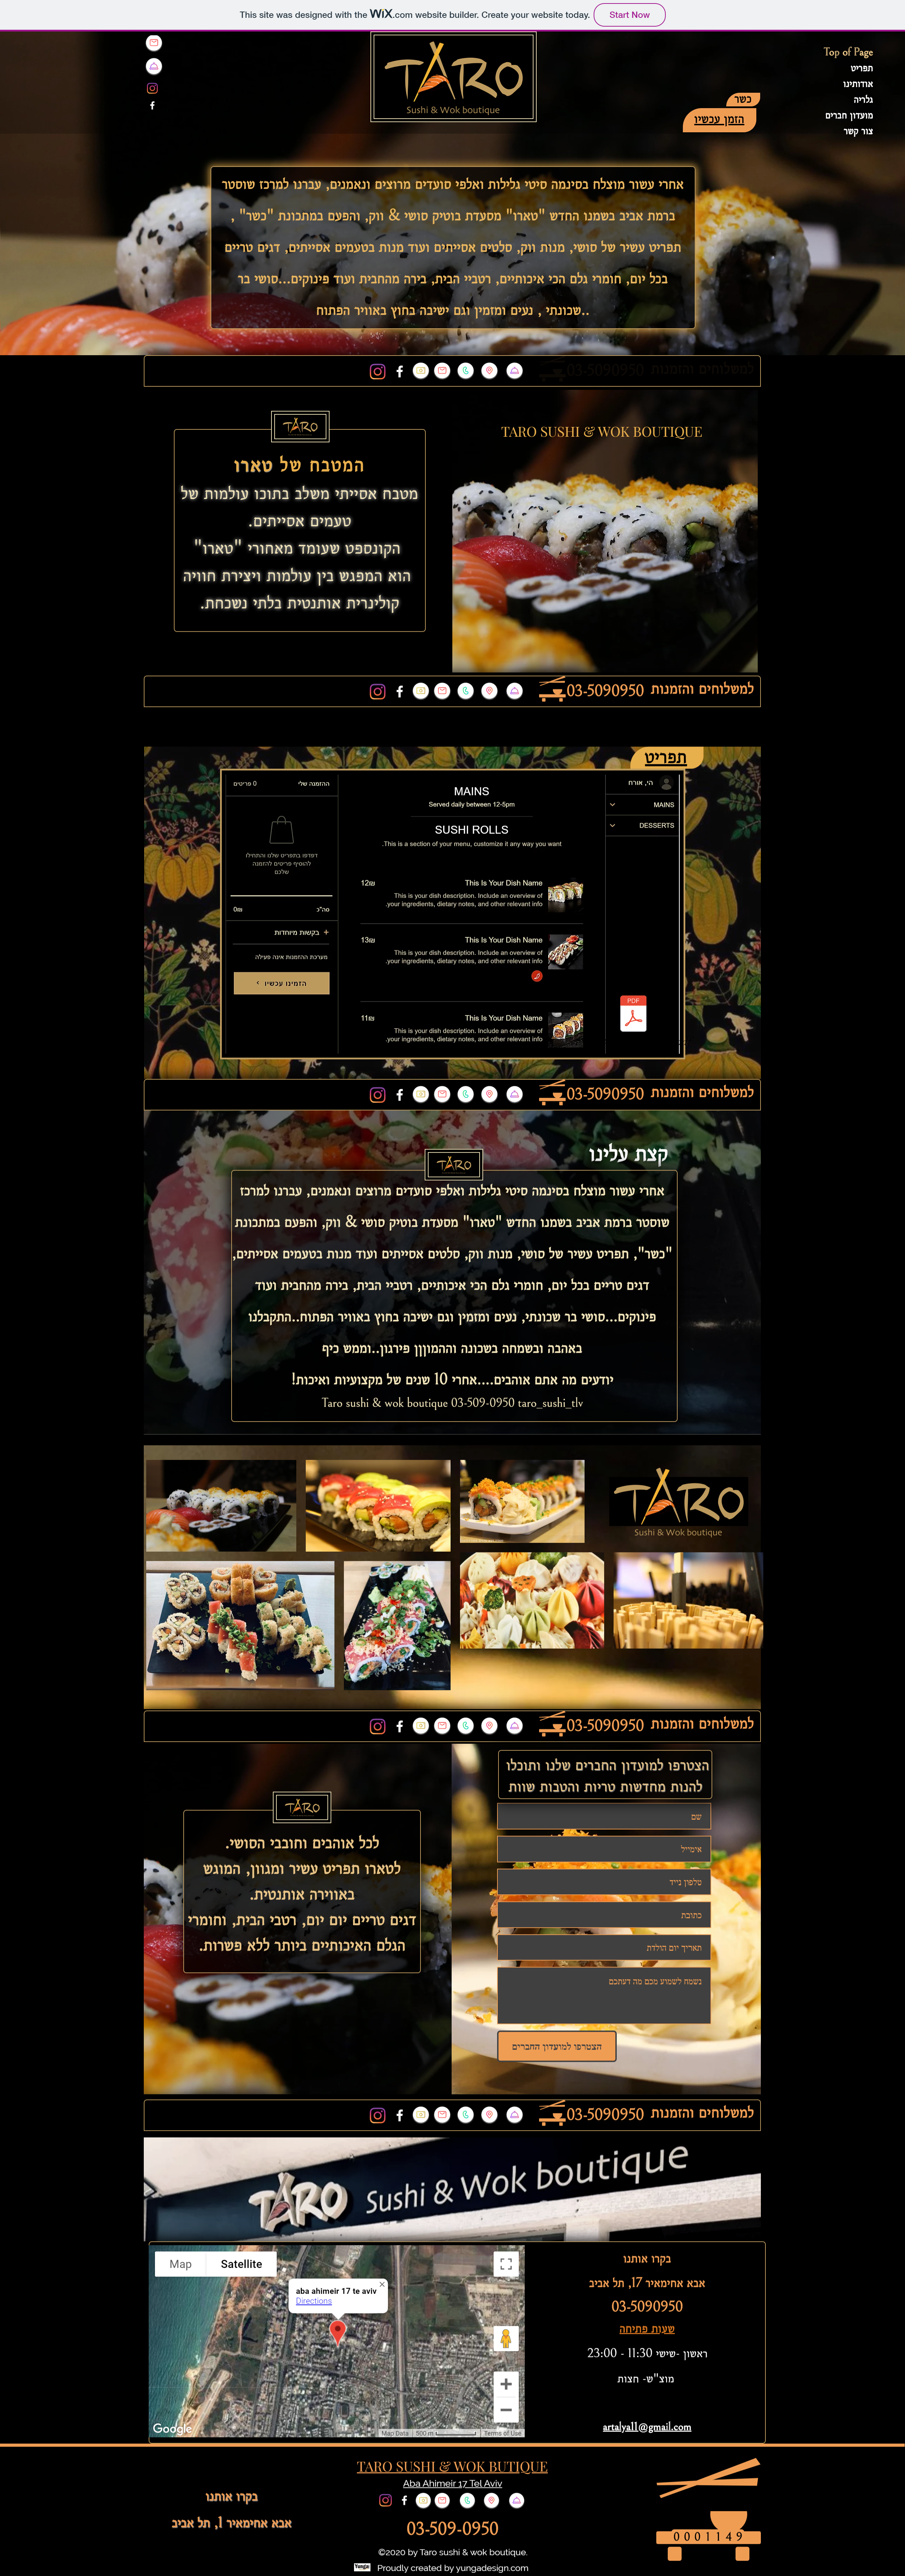 Taro sushi & wok boutique